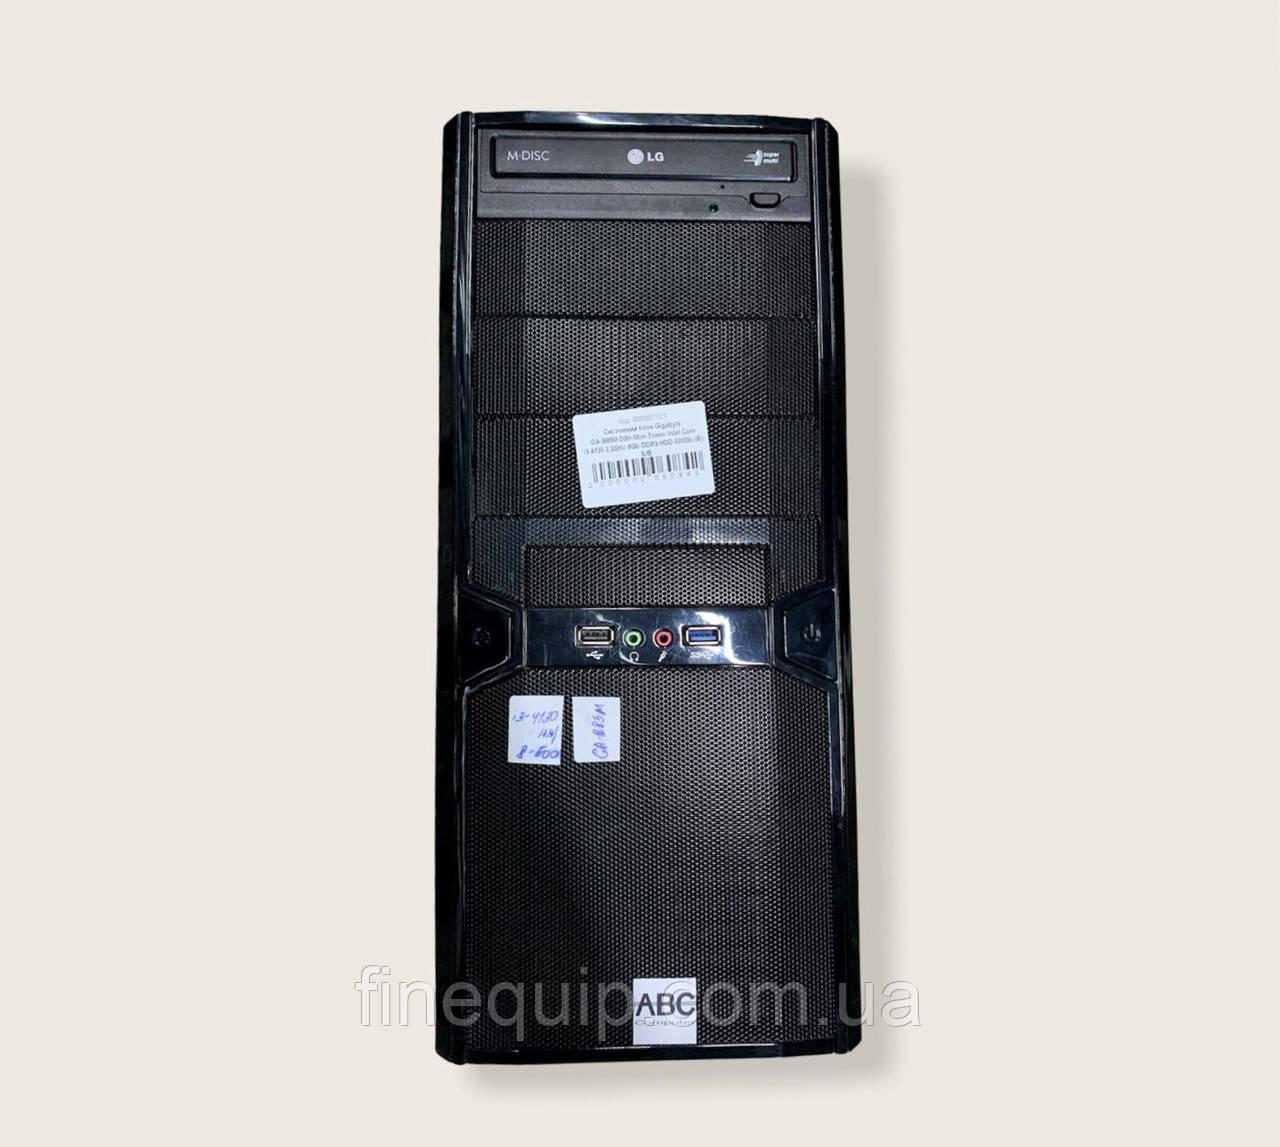 Системний блок-Gigabyte GA-B85M-D3H-Mini-Tower-Intel Core i3-4130-3,3GHz-8Gb-DDR3-HDD-500Gb-(B)- Б/В